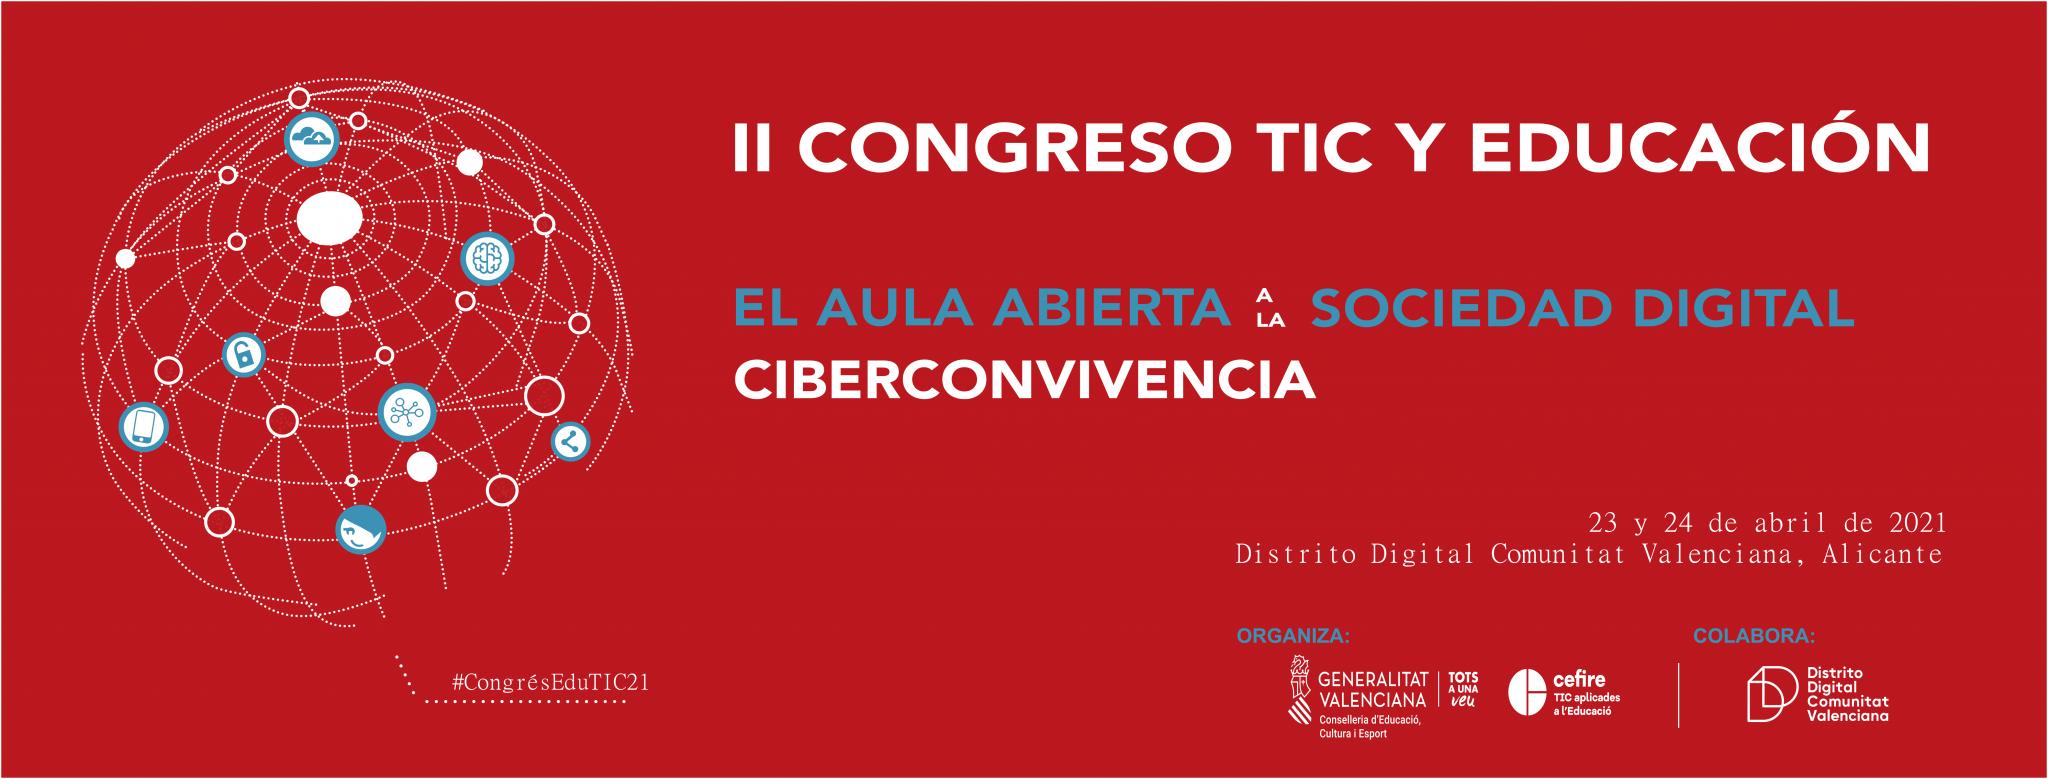 banner_IIcongresoTIC_es